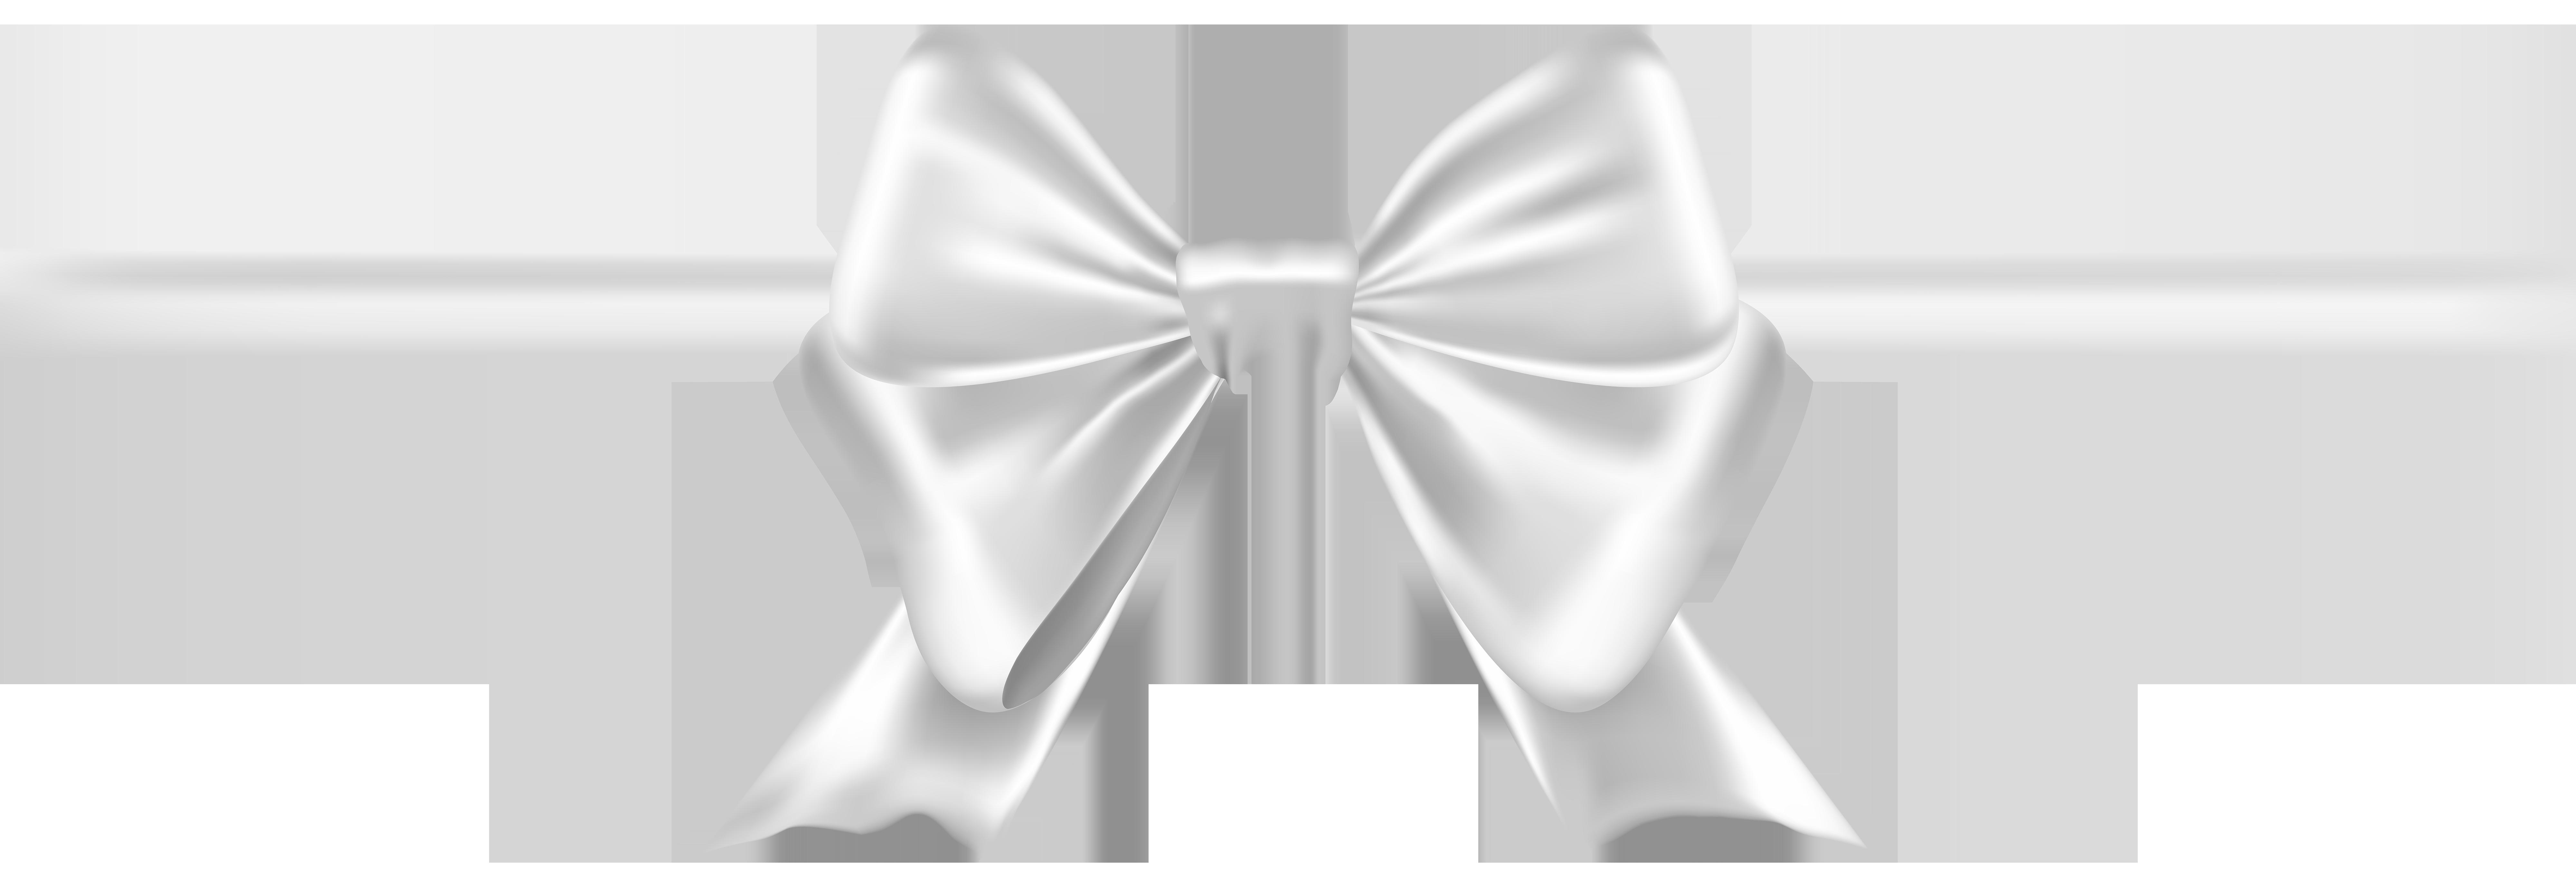 White transparent clip art. Clipart rainbow bow tie